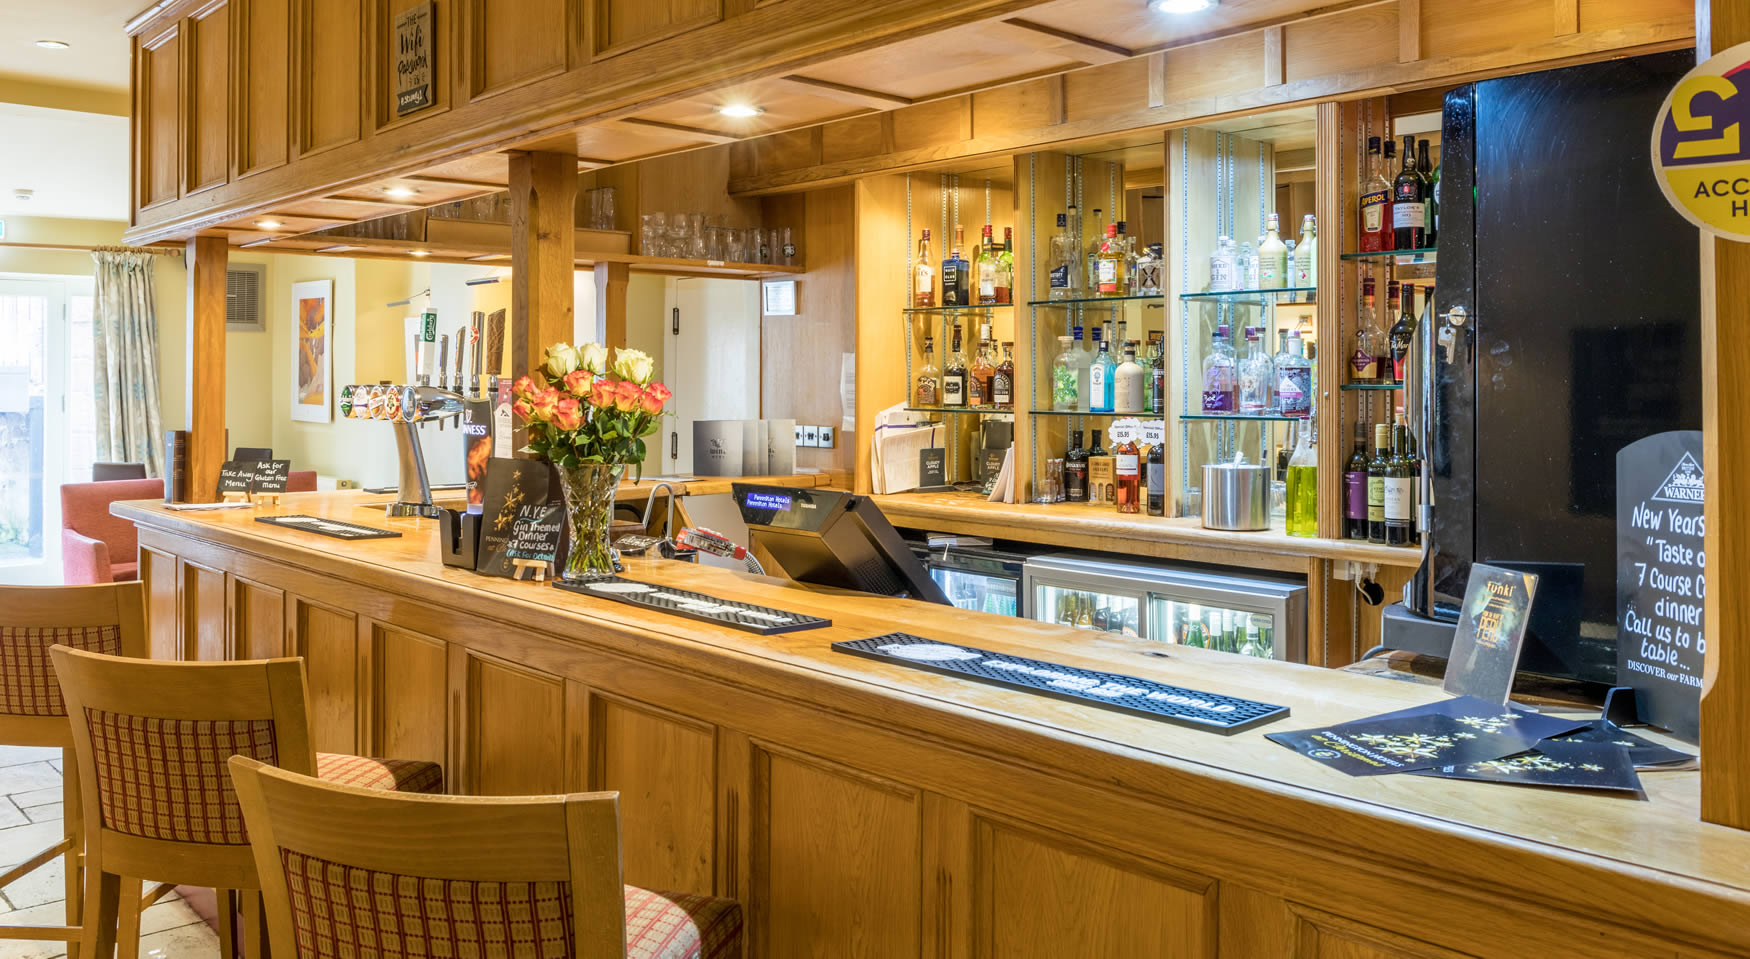 Pennington Hotel Bar